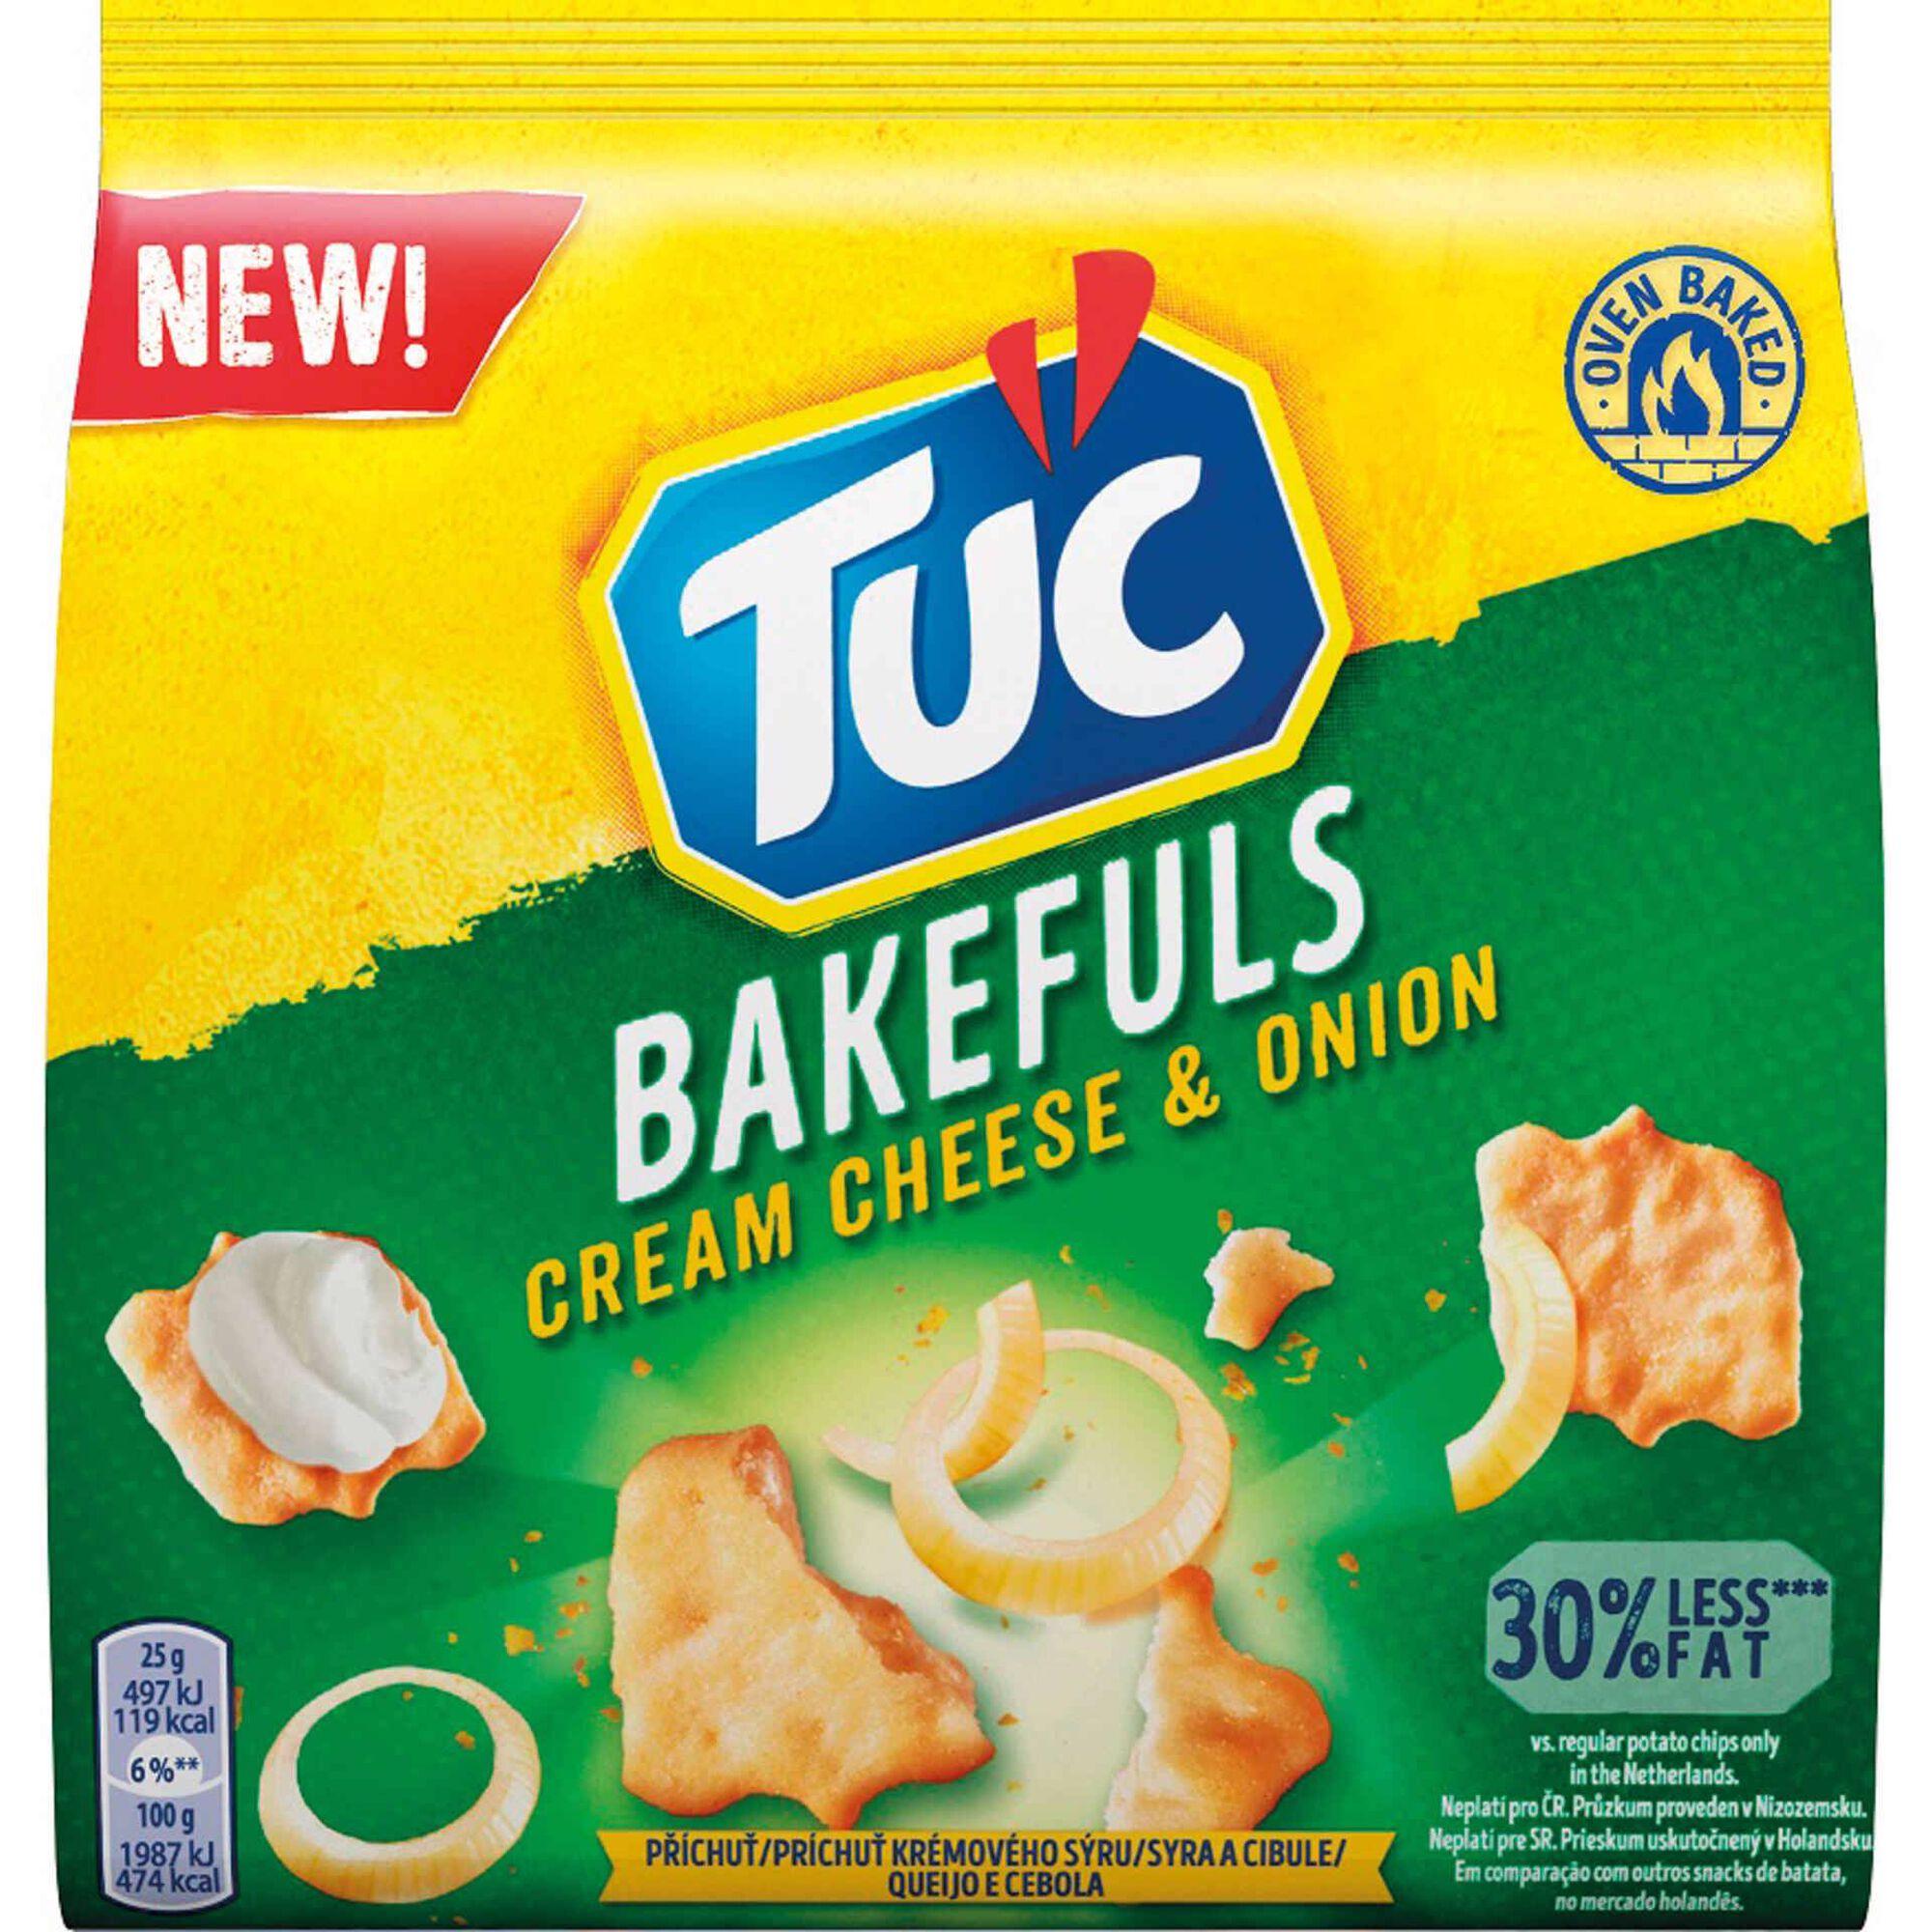 Bolachas Bakeful Cream Cheese & Onion